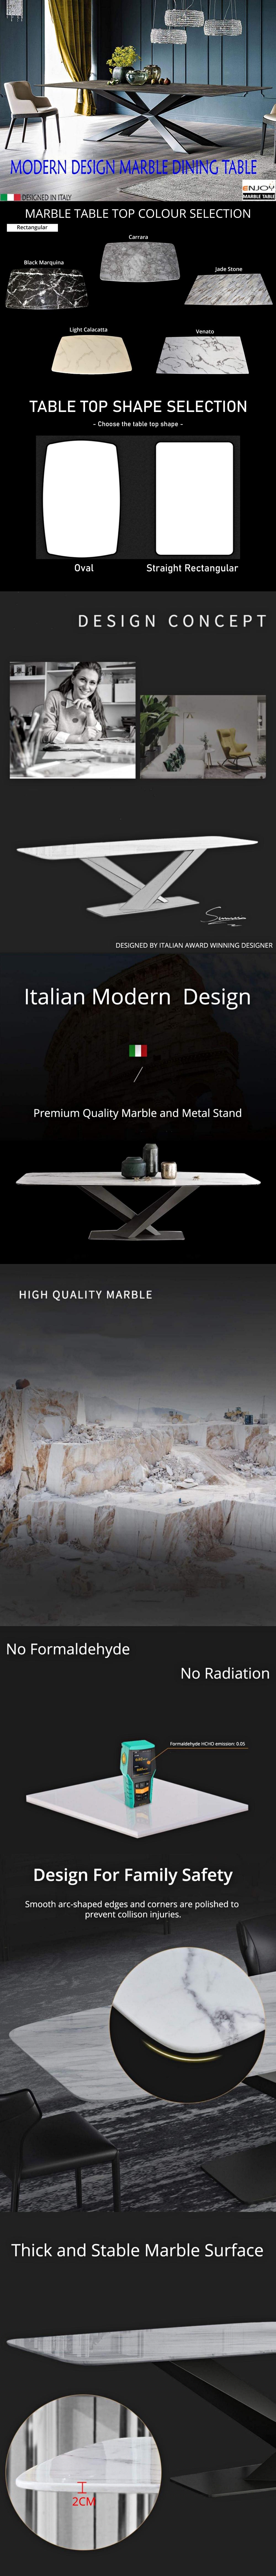 Rectangular-Cross-Base-Dining-Table-Item-Description-1